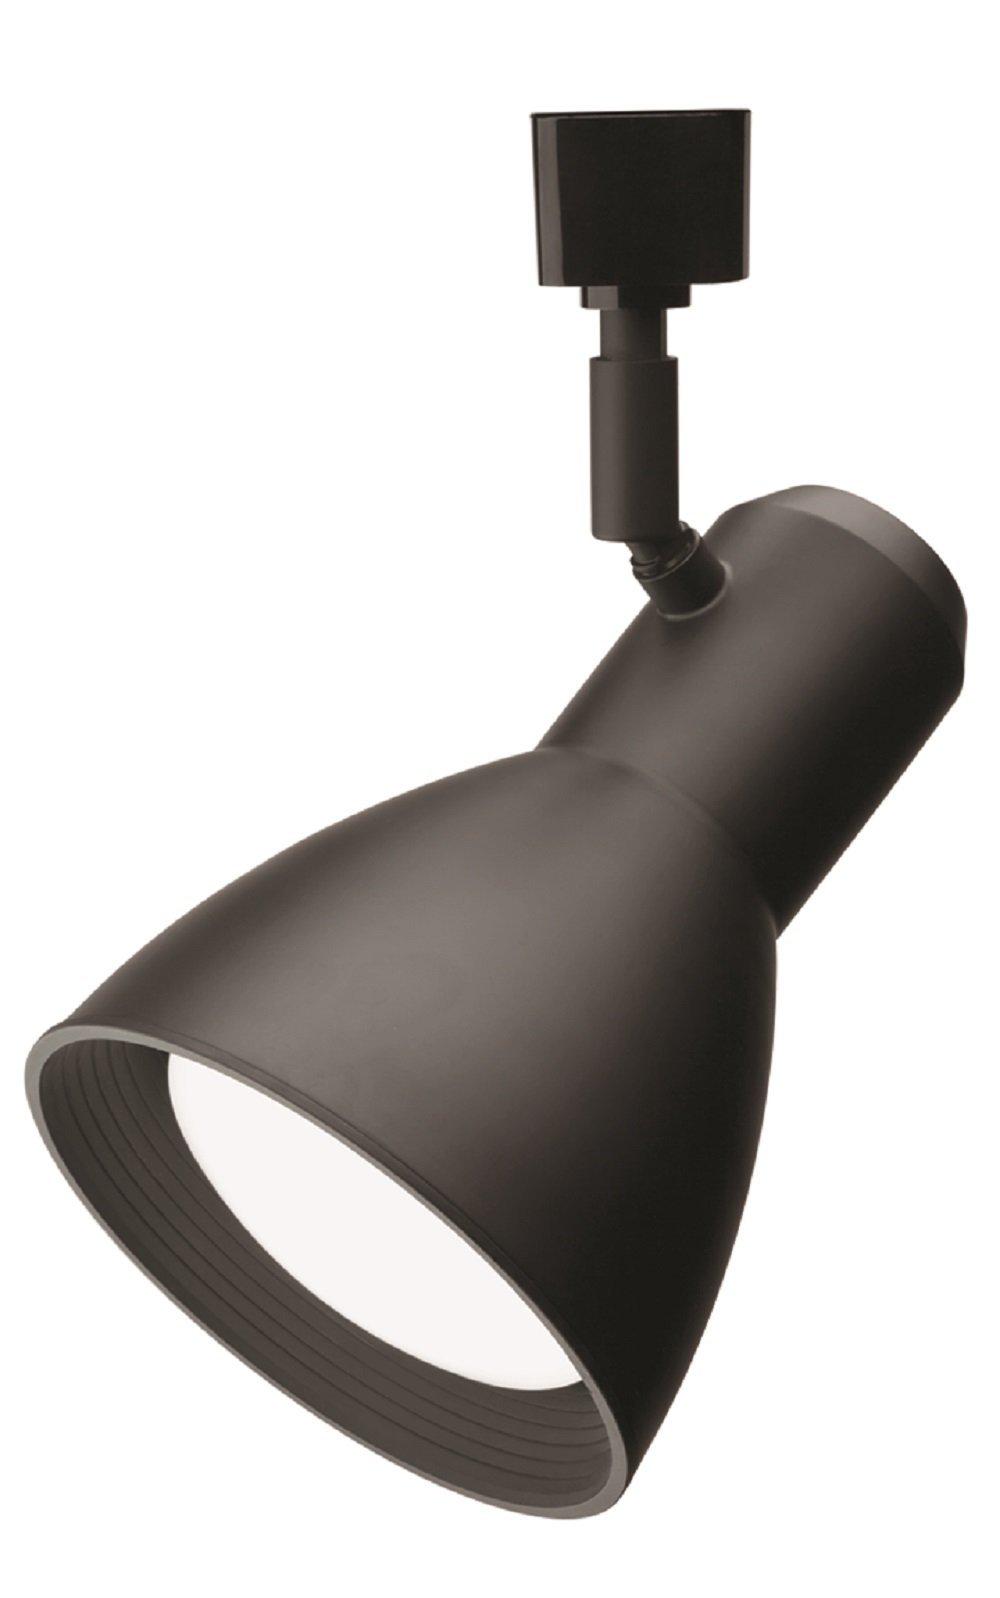 Lithonia Lighting LTHSTBF BR30 LED 27K DBL M4 LED Step Baffle Track Head, 27K, Black,